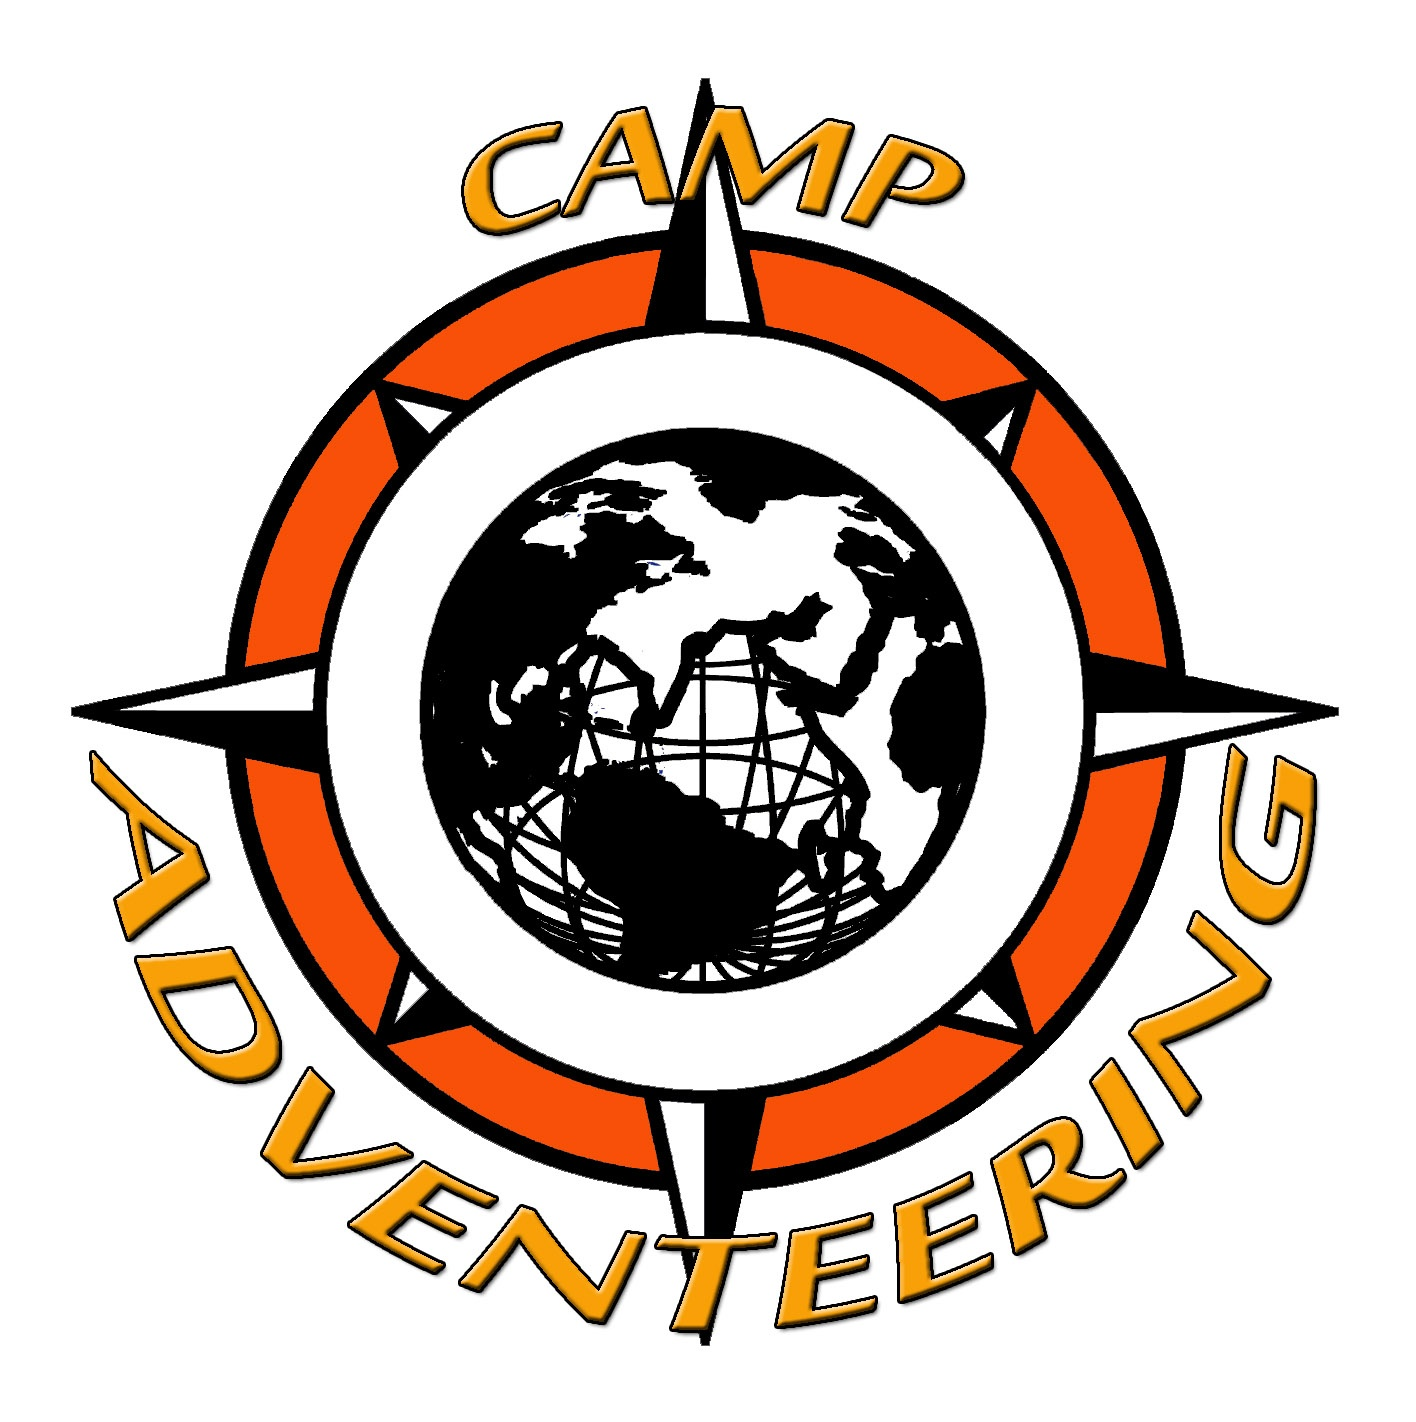 Camp adventeering - Diventa operatore scolastico